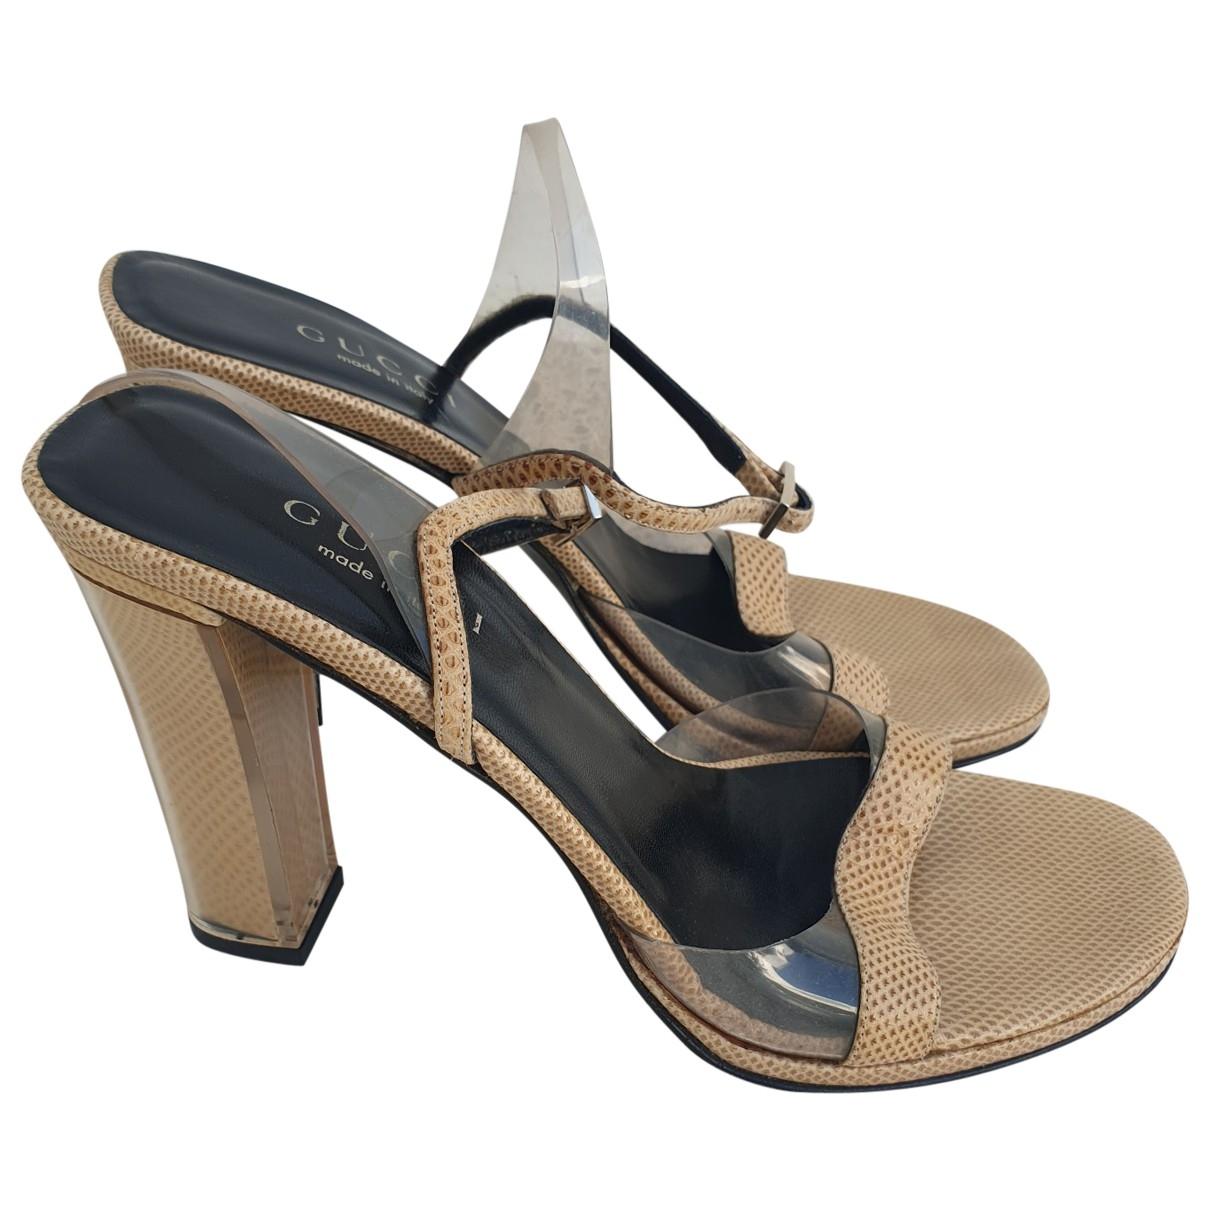 Gucci \N Beige Leather Sandals for Women 38.5 EU